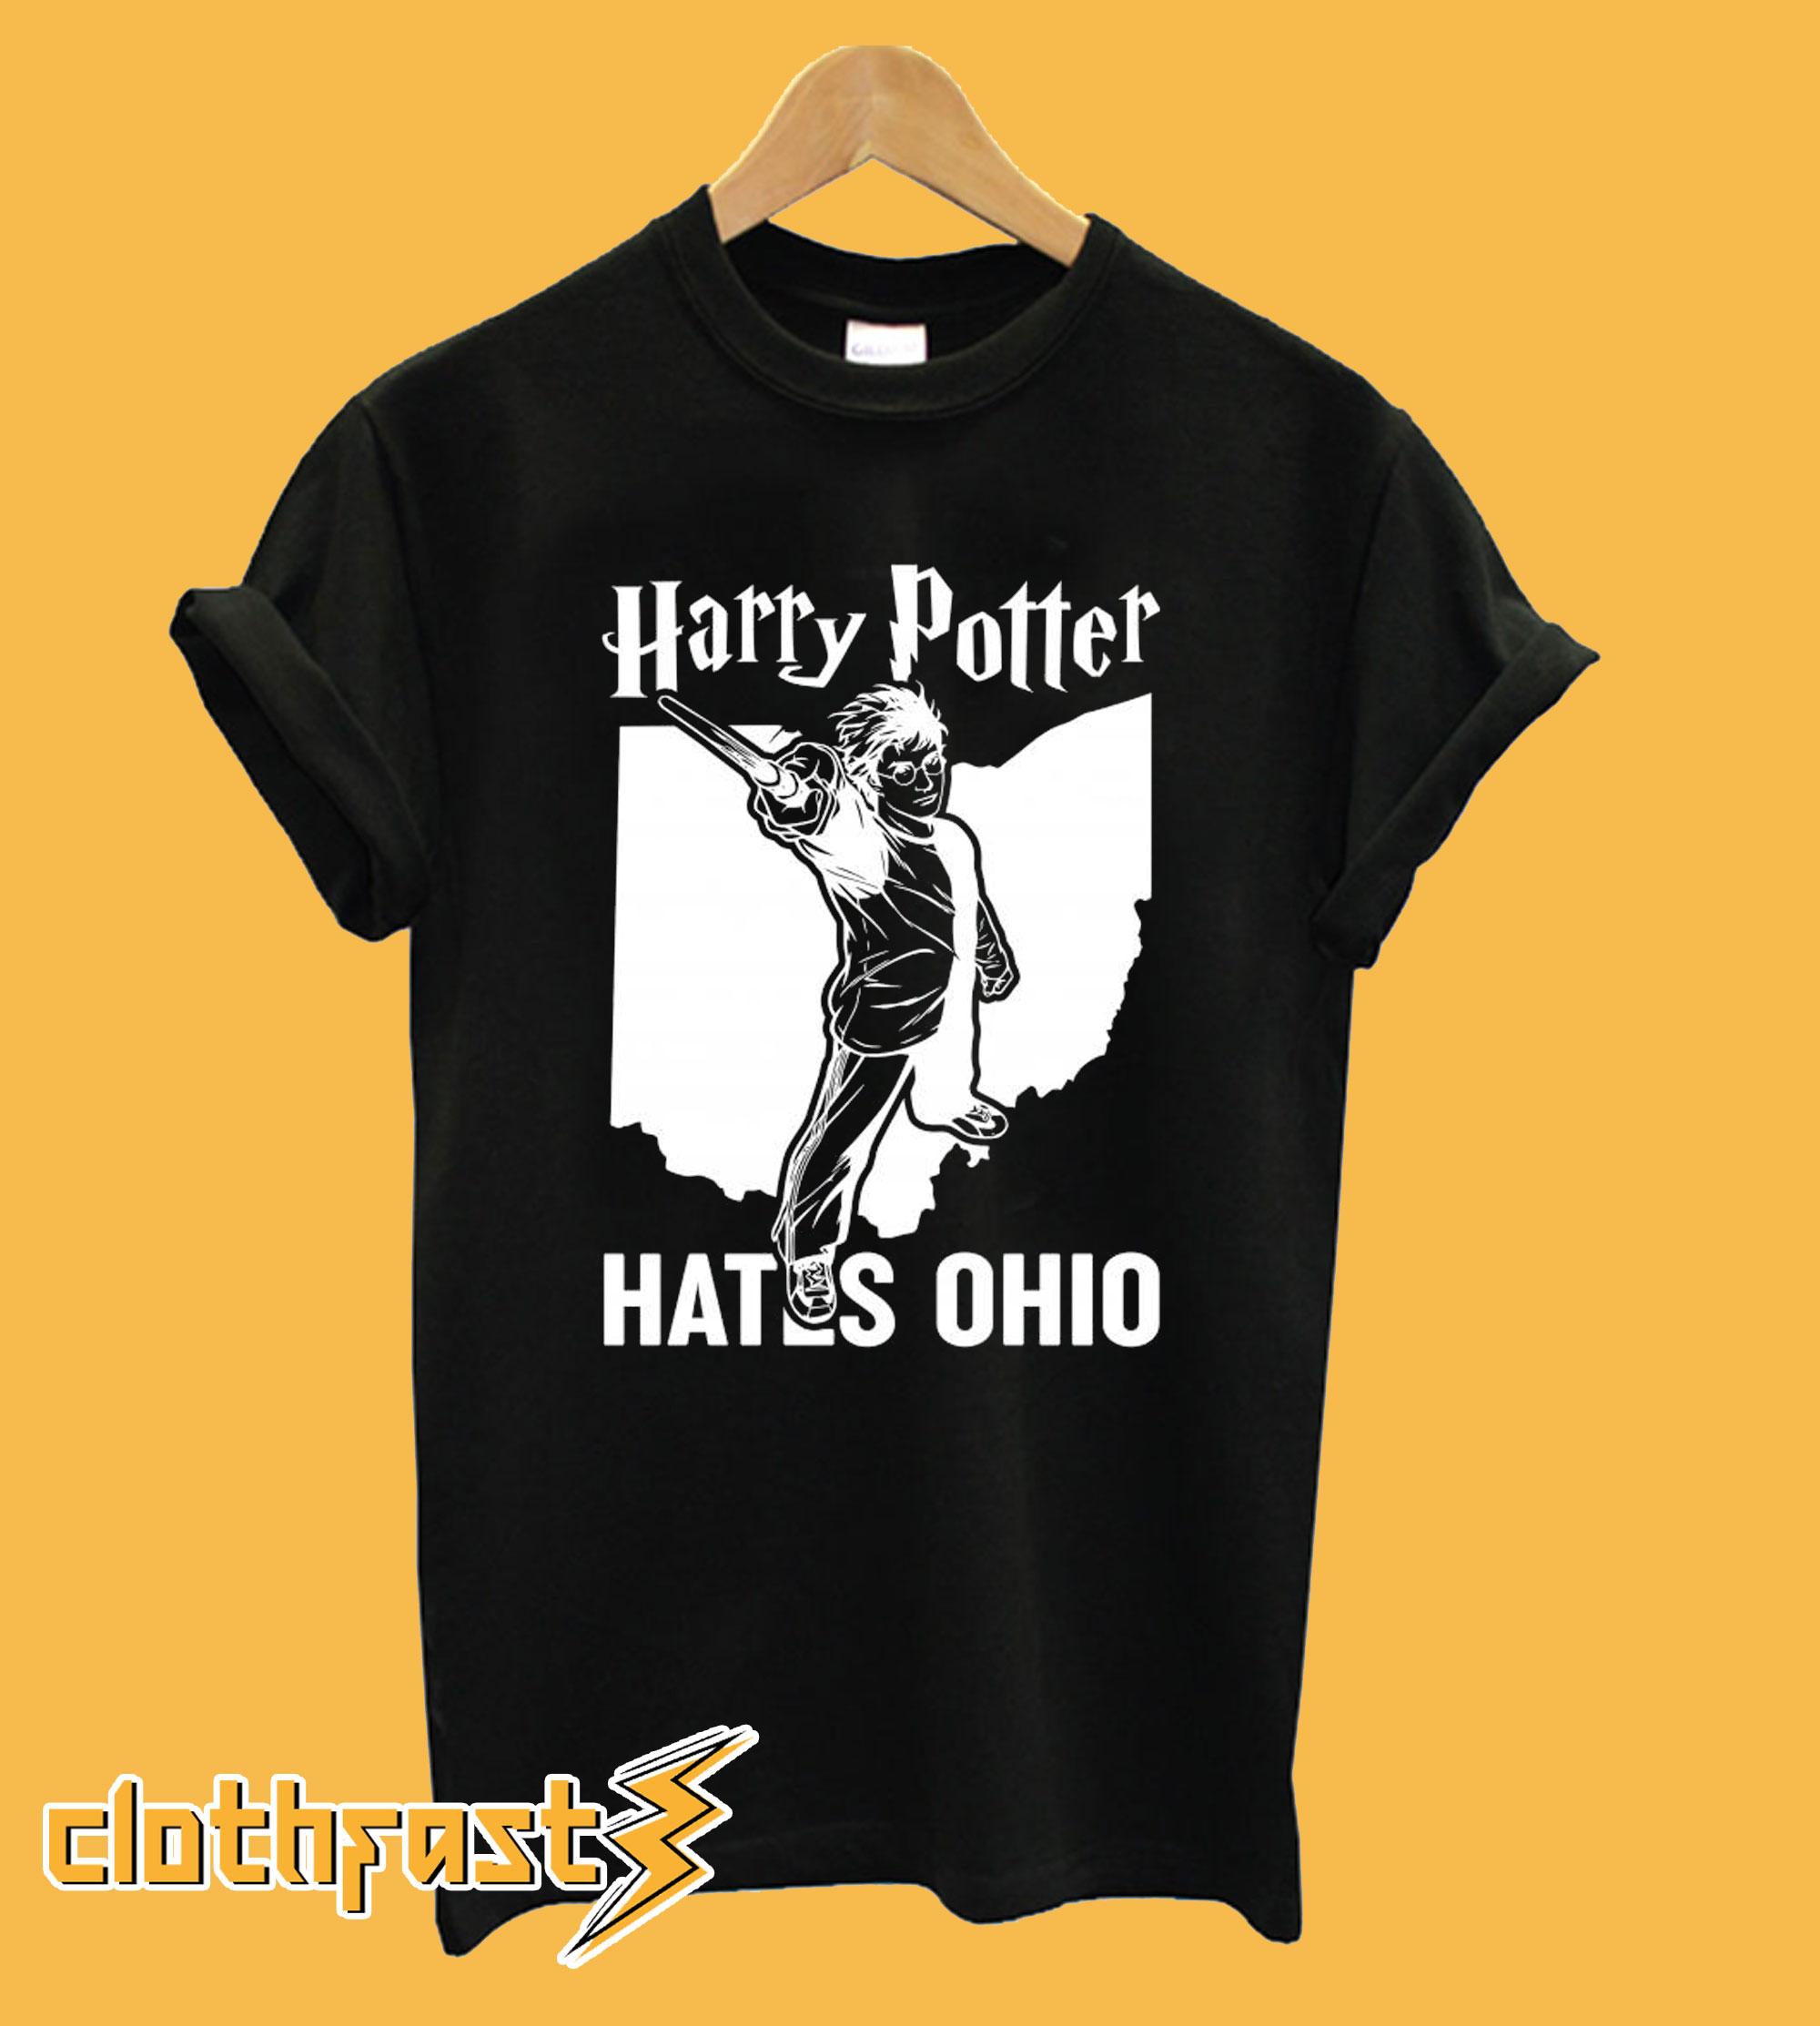 Harry Potter Hates Ohio T shirt